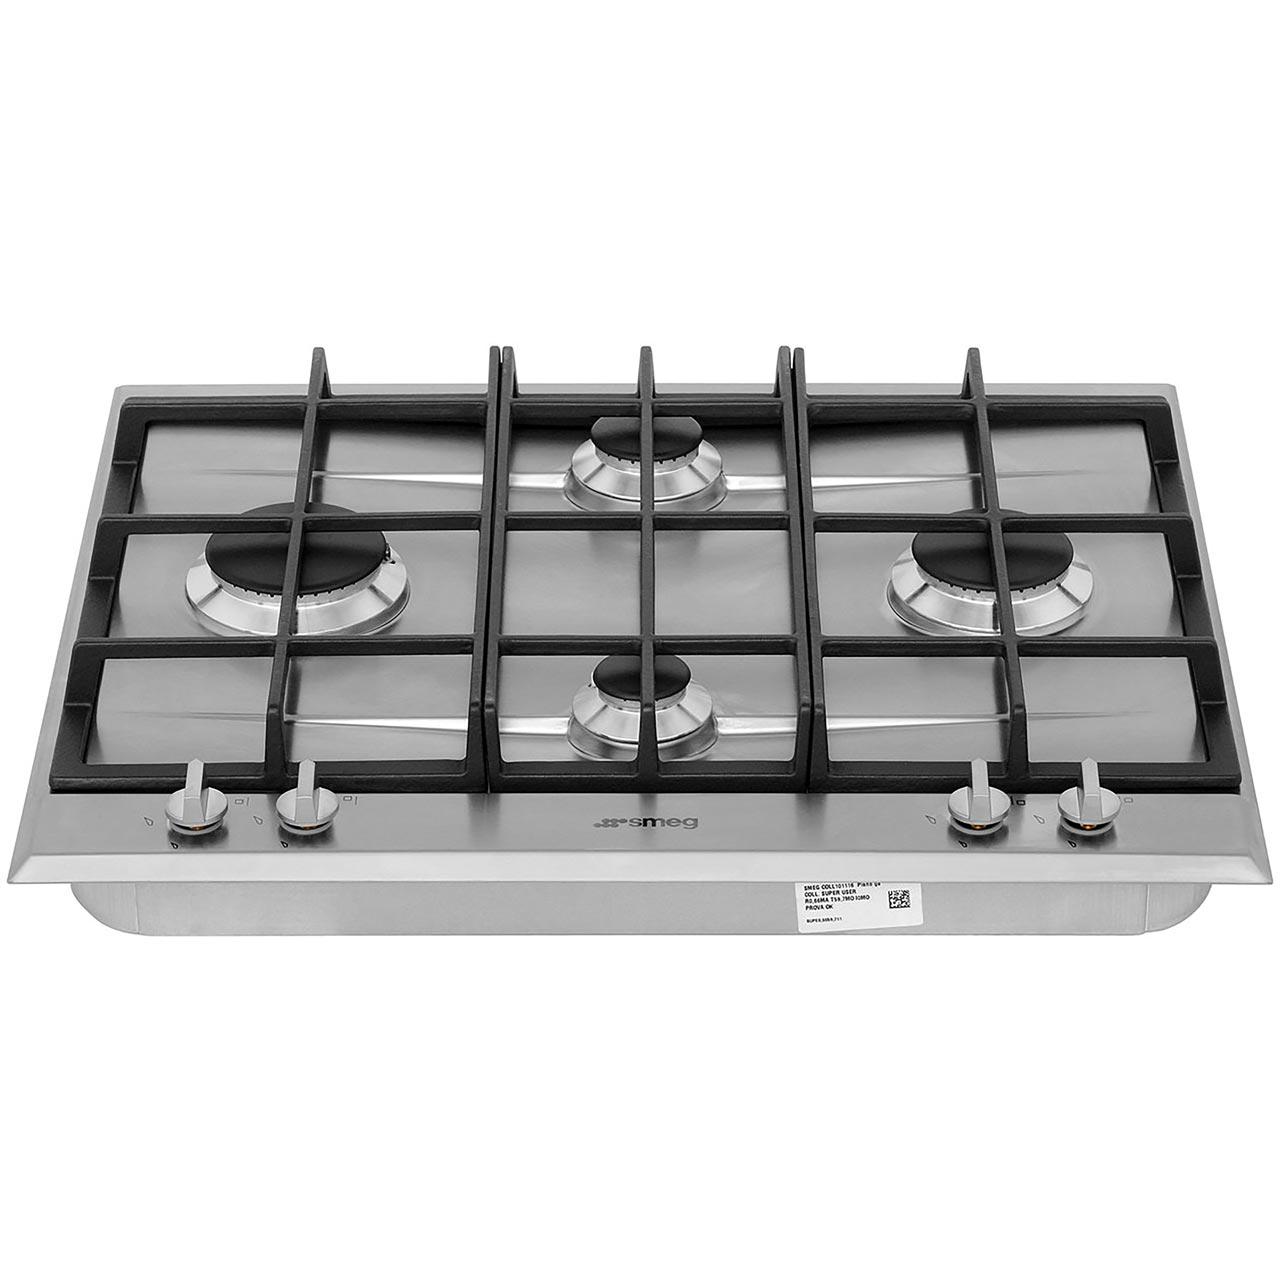 Smeg cucina p260xgh 60cm gas hob stainless steel - Smeg cucina gas ...